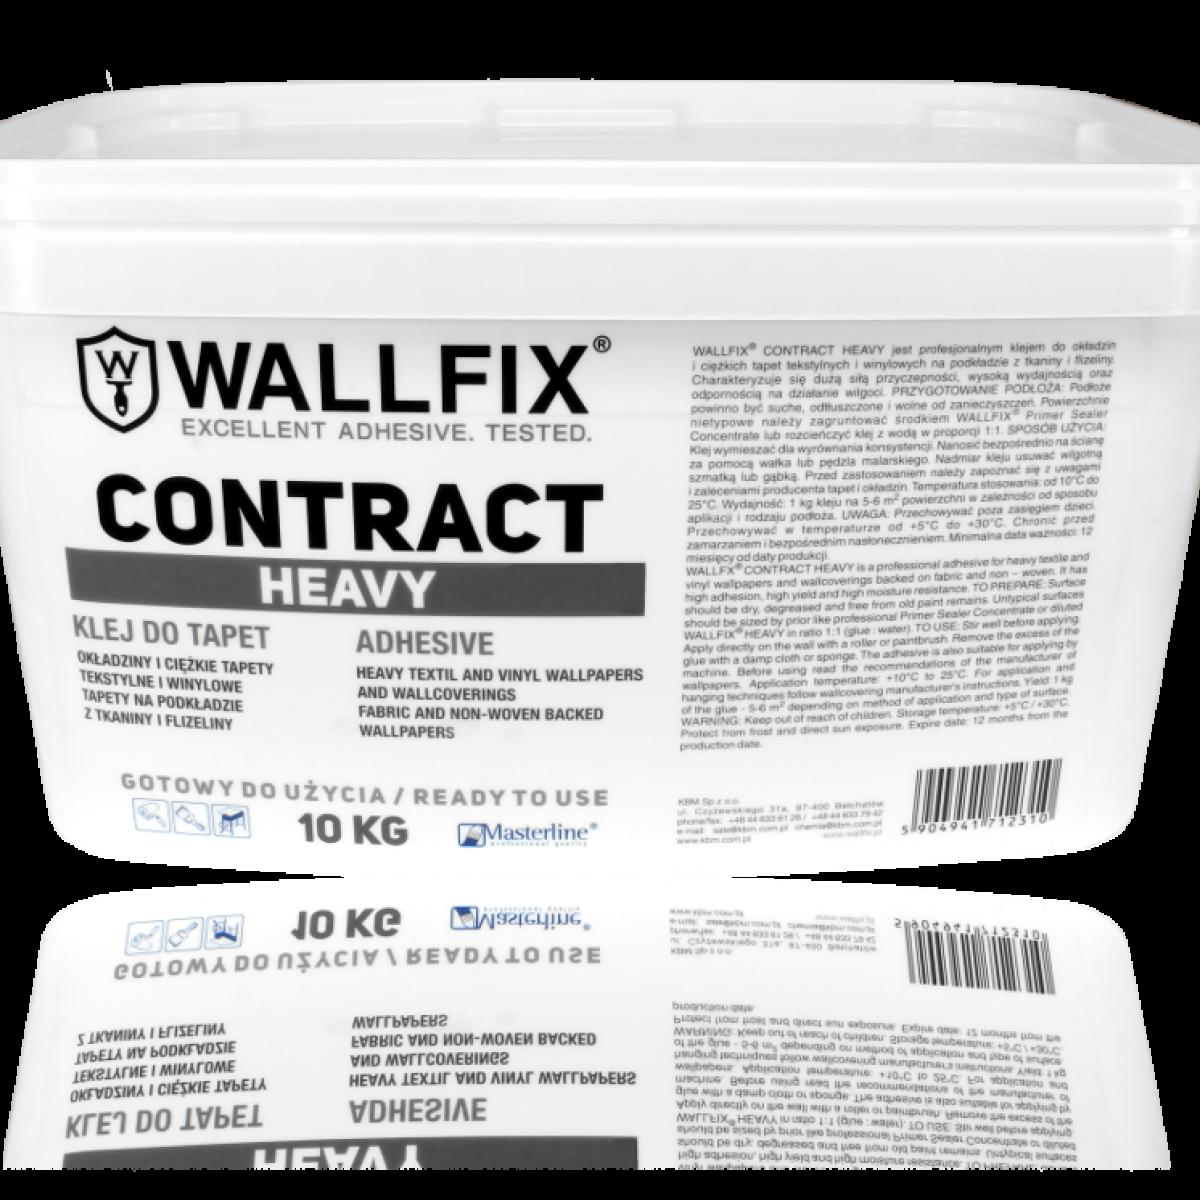 Adeziv pastă WALLFIX Heavy pentru tapet vinilic greu, 2.5 kg